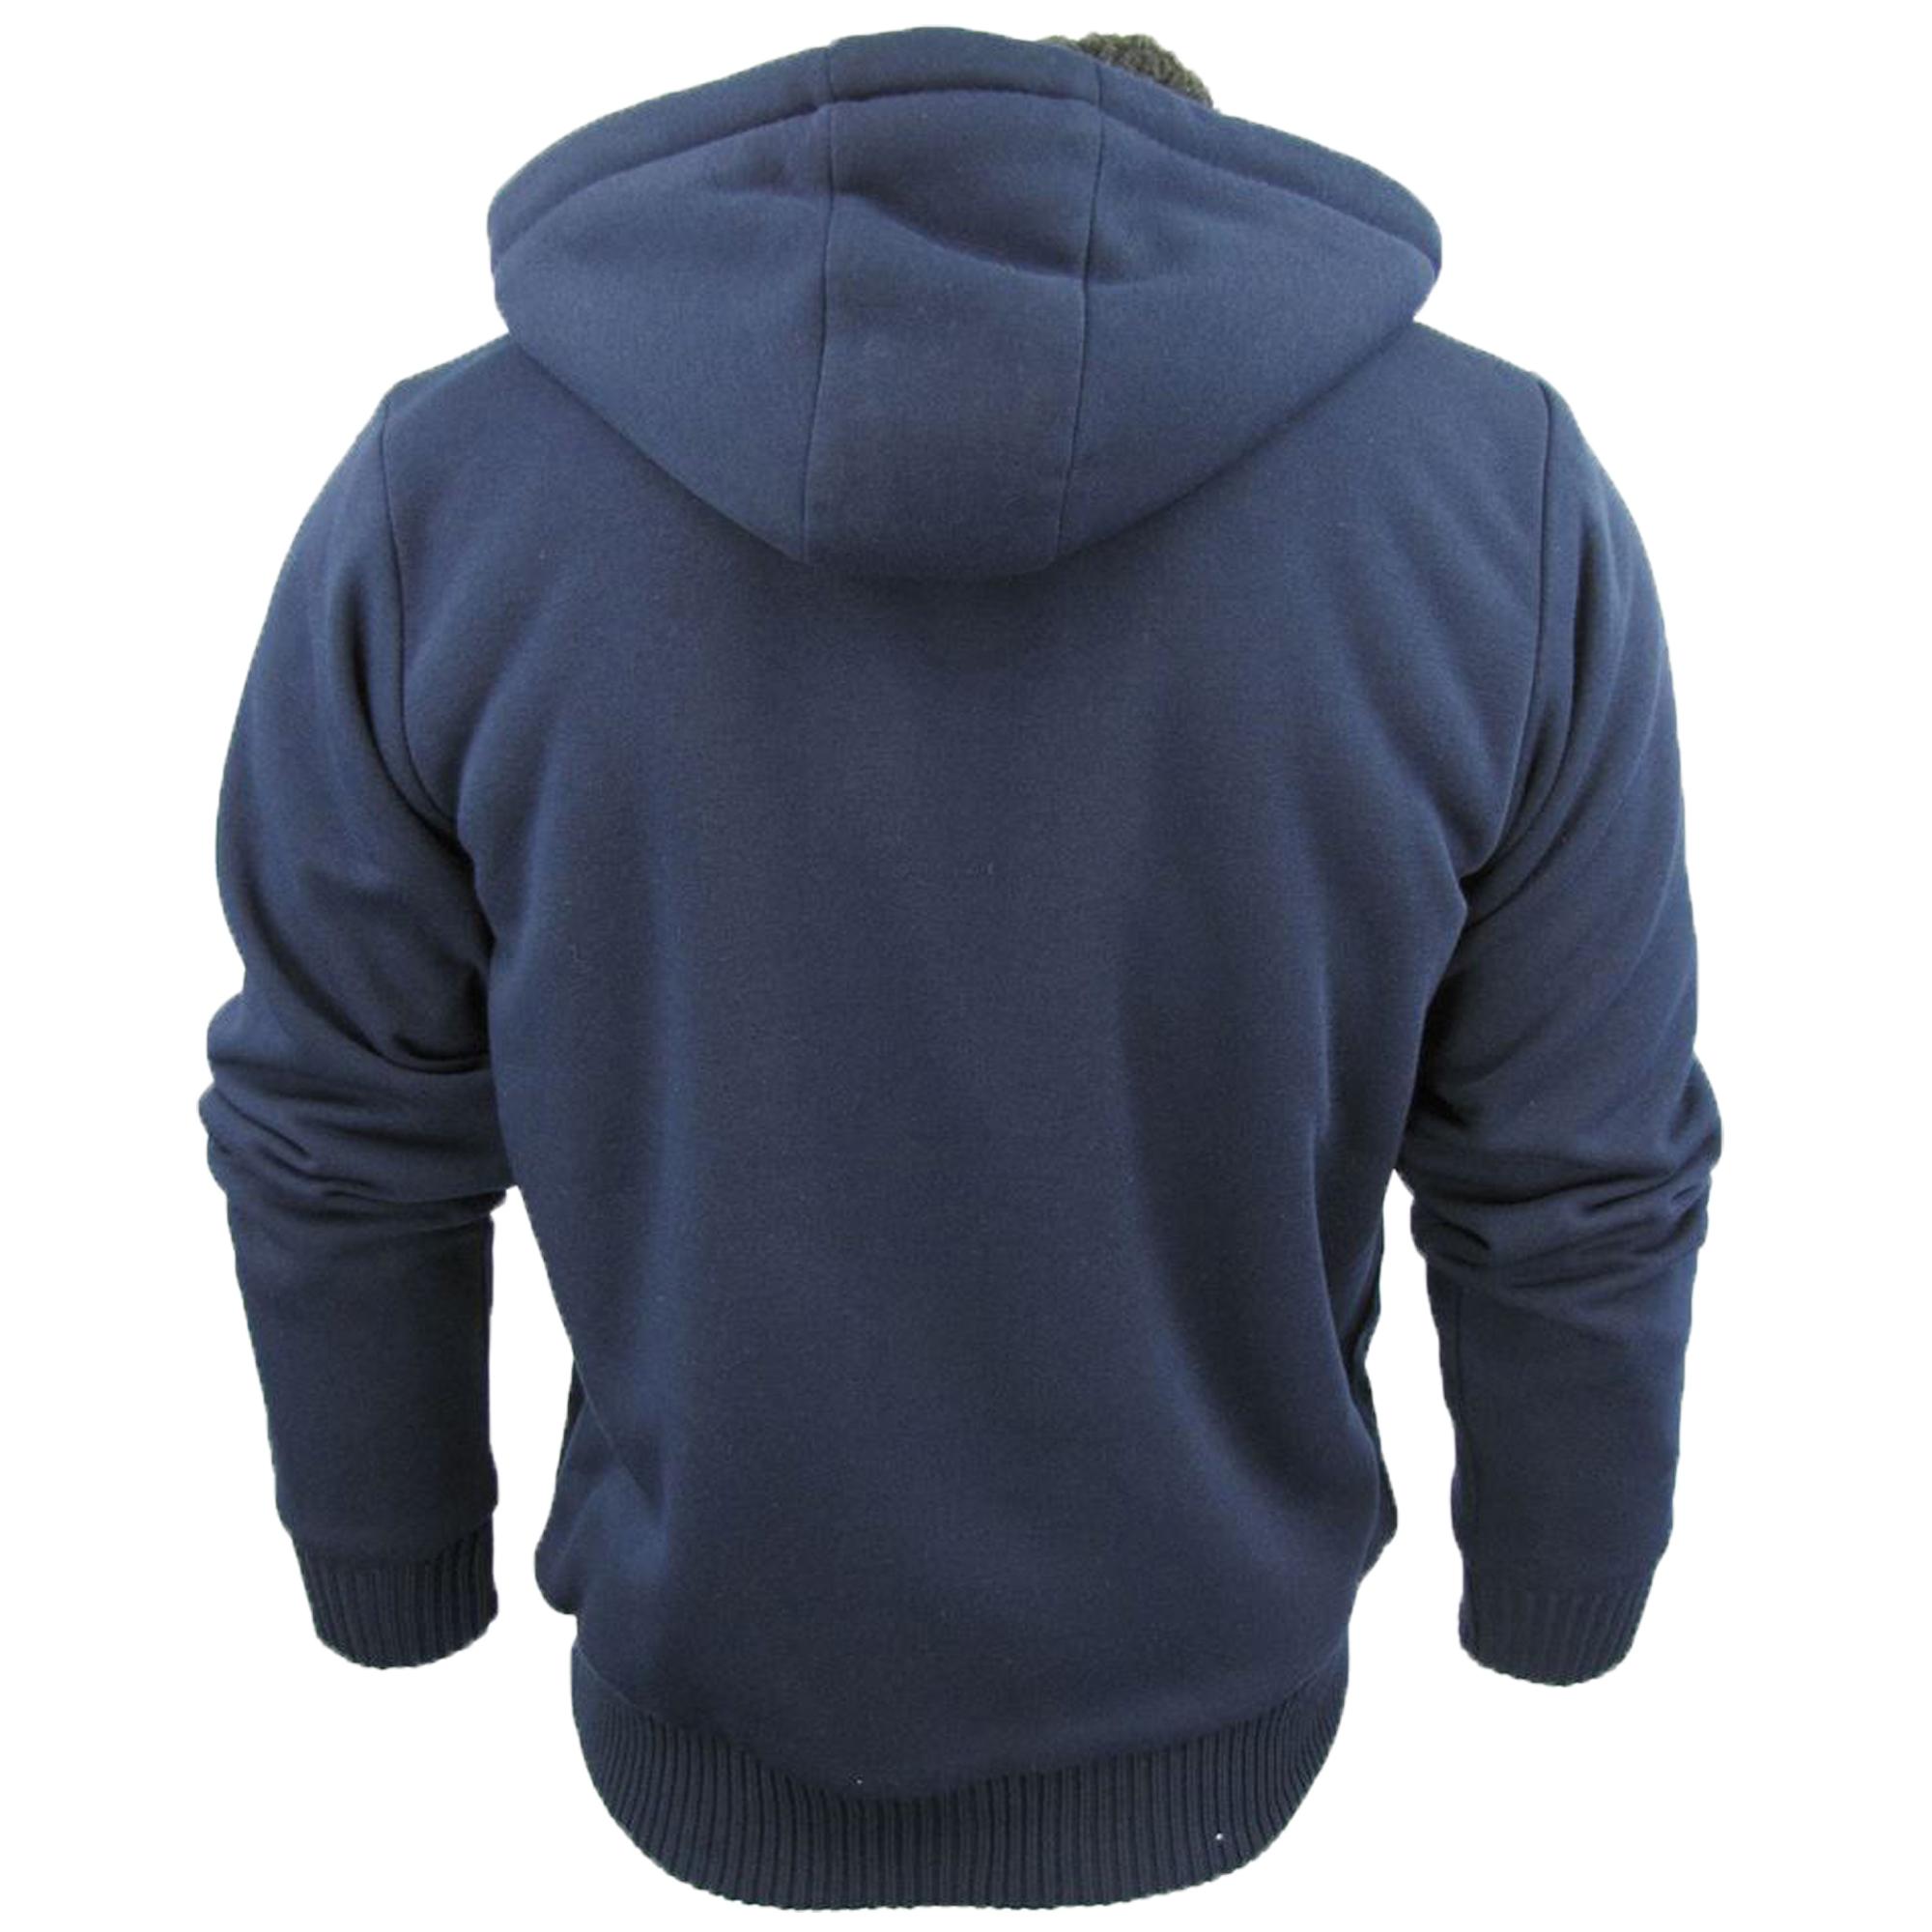 Mens-Jacket-Dissident-Sweatshirt-Hooded-Top-Sherpa-Fleece-Lined-Heavy-BOLO-New thumbnail 7